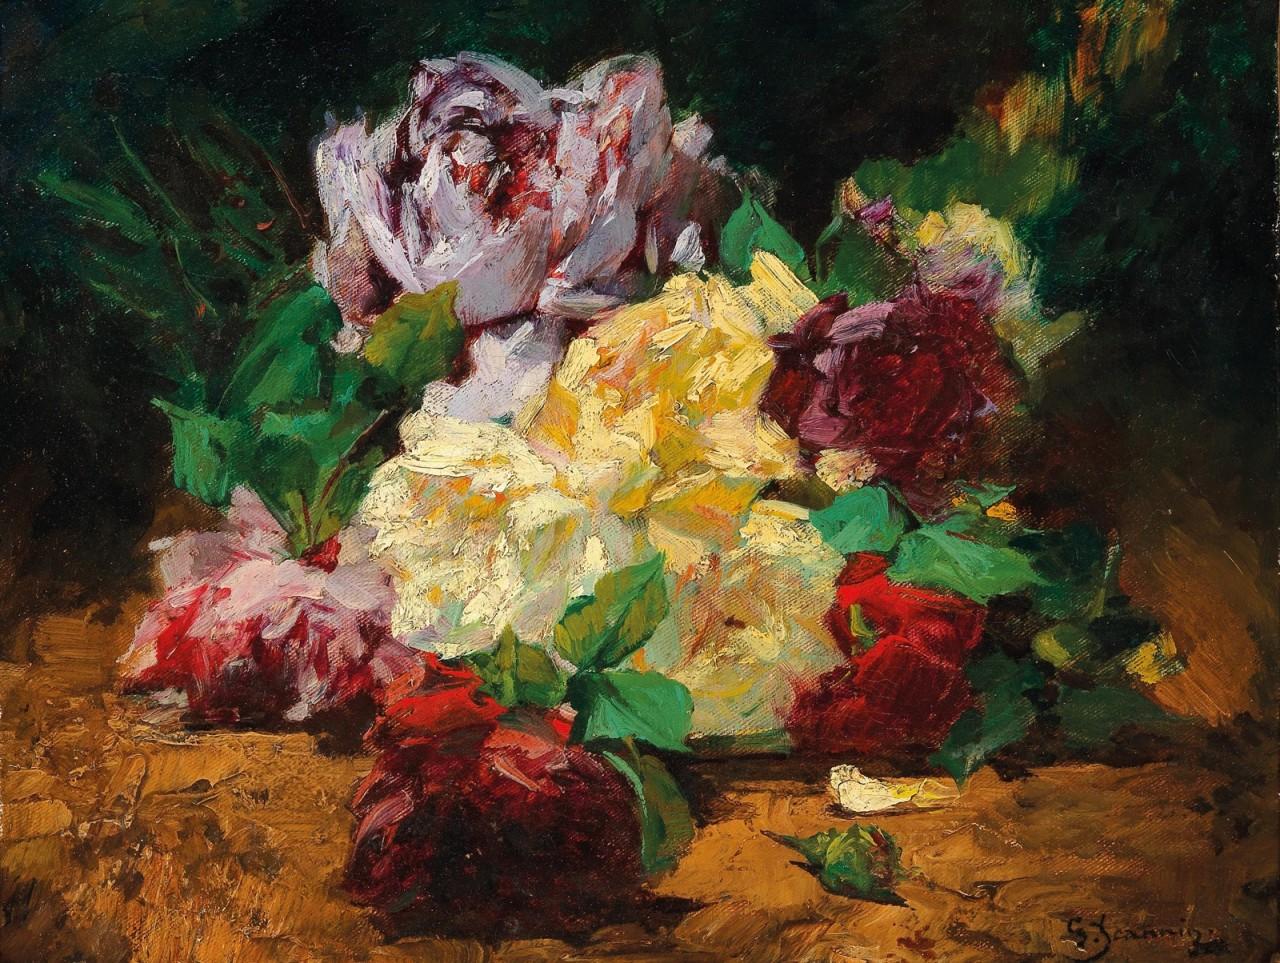 Жорж Женнин (Georges Jeannin), 1841-1925. Франция